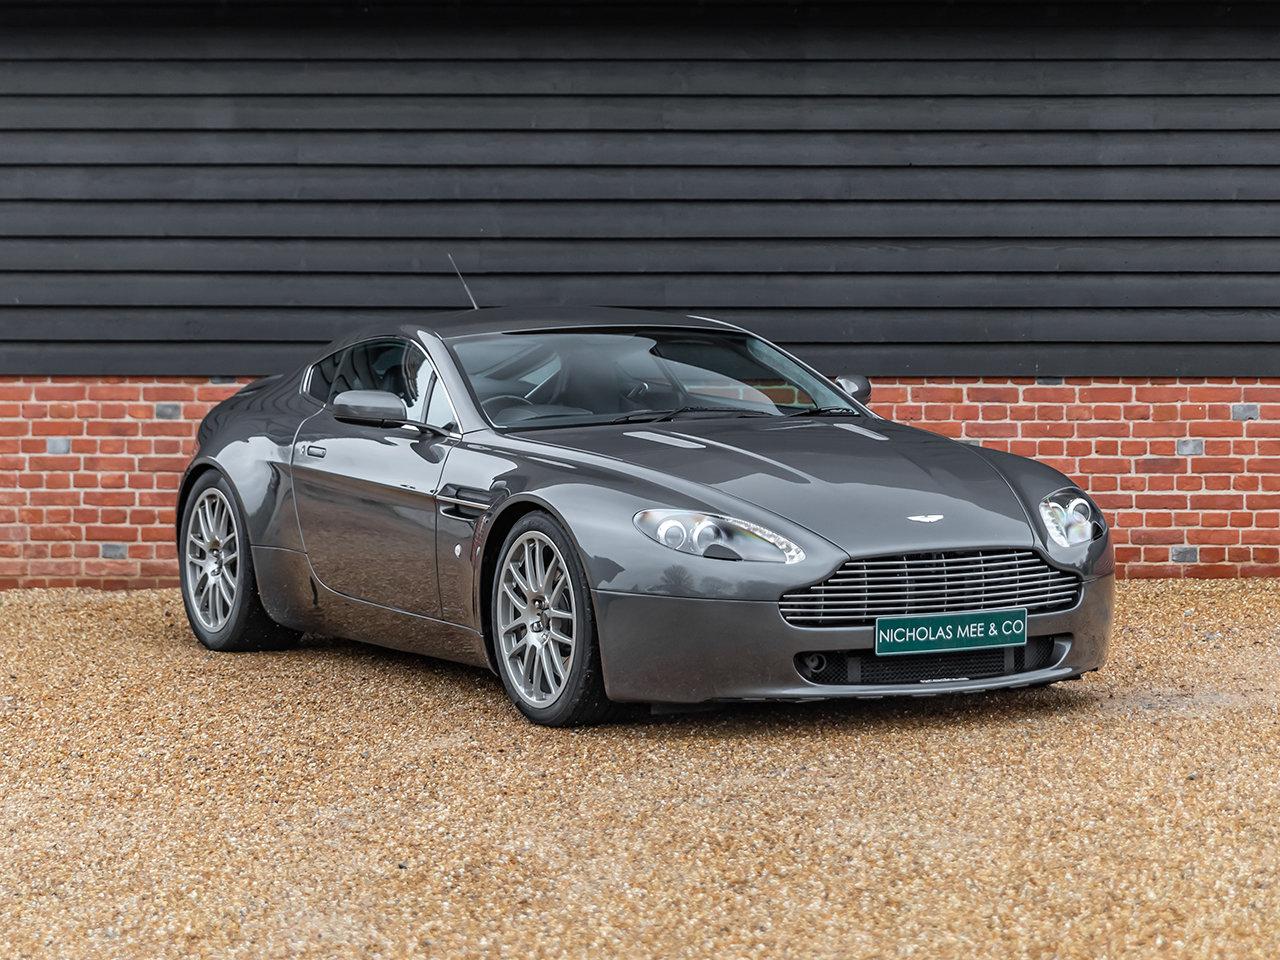 2006 Aston Martin V8 Vantage - Prodrive  For Sale (picture 1 of 6)